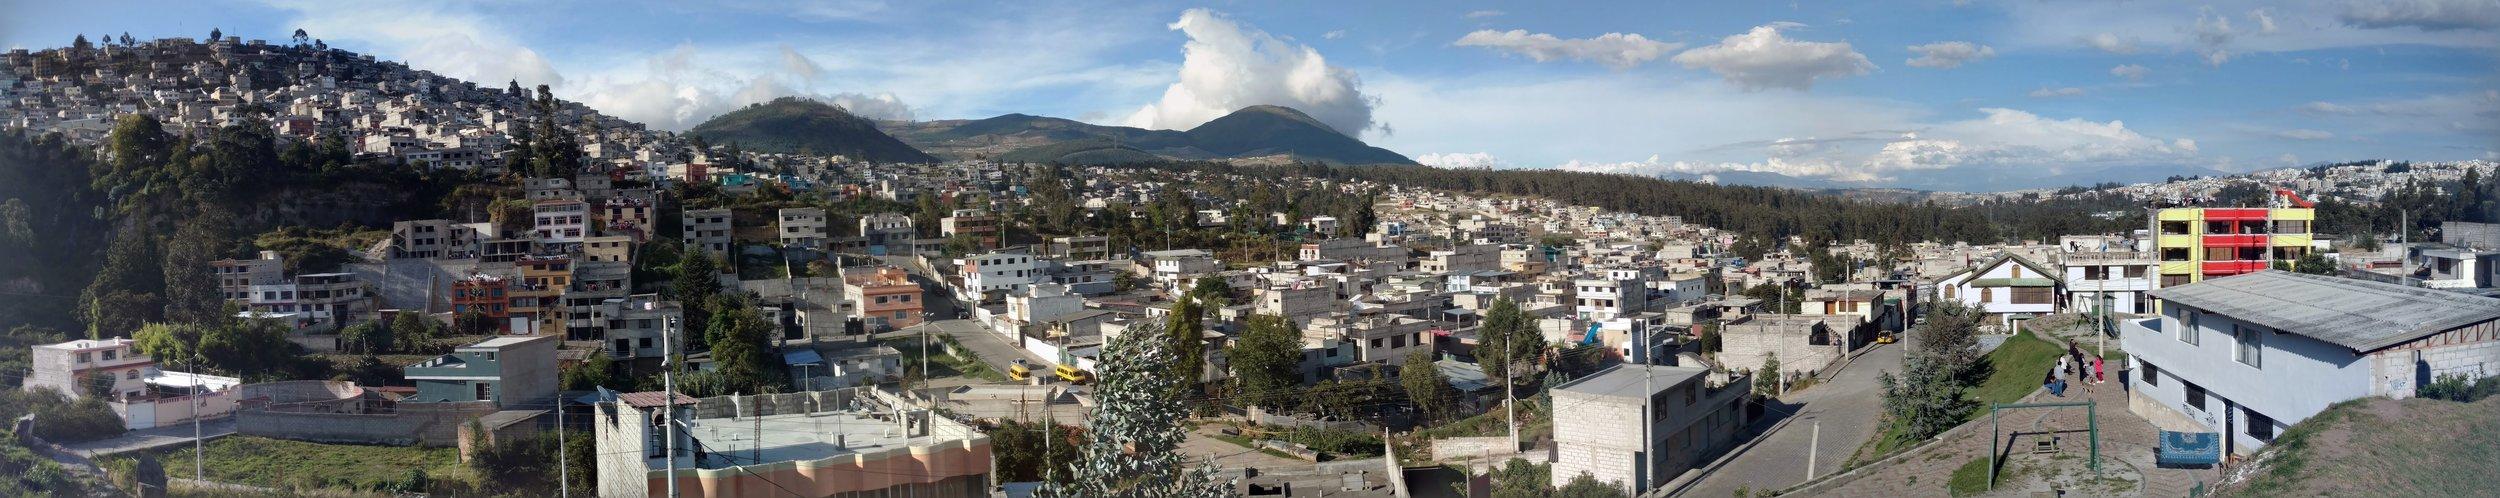 A view over Las Colinas del Norte, Quito